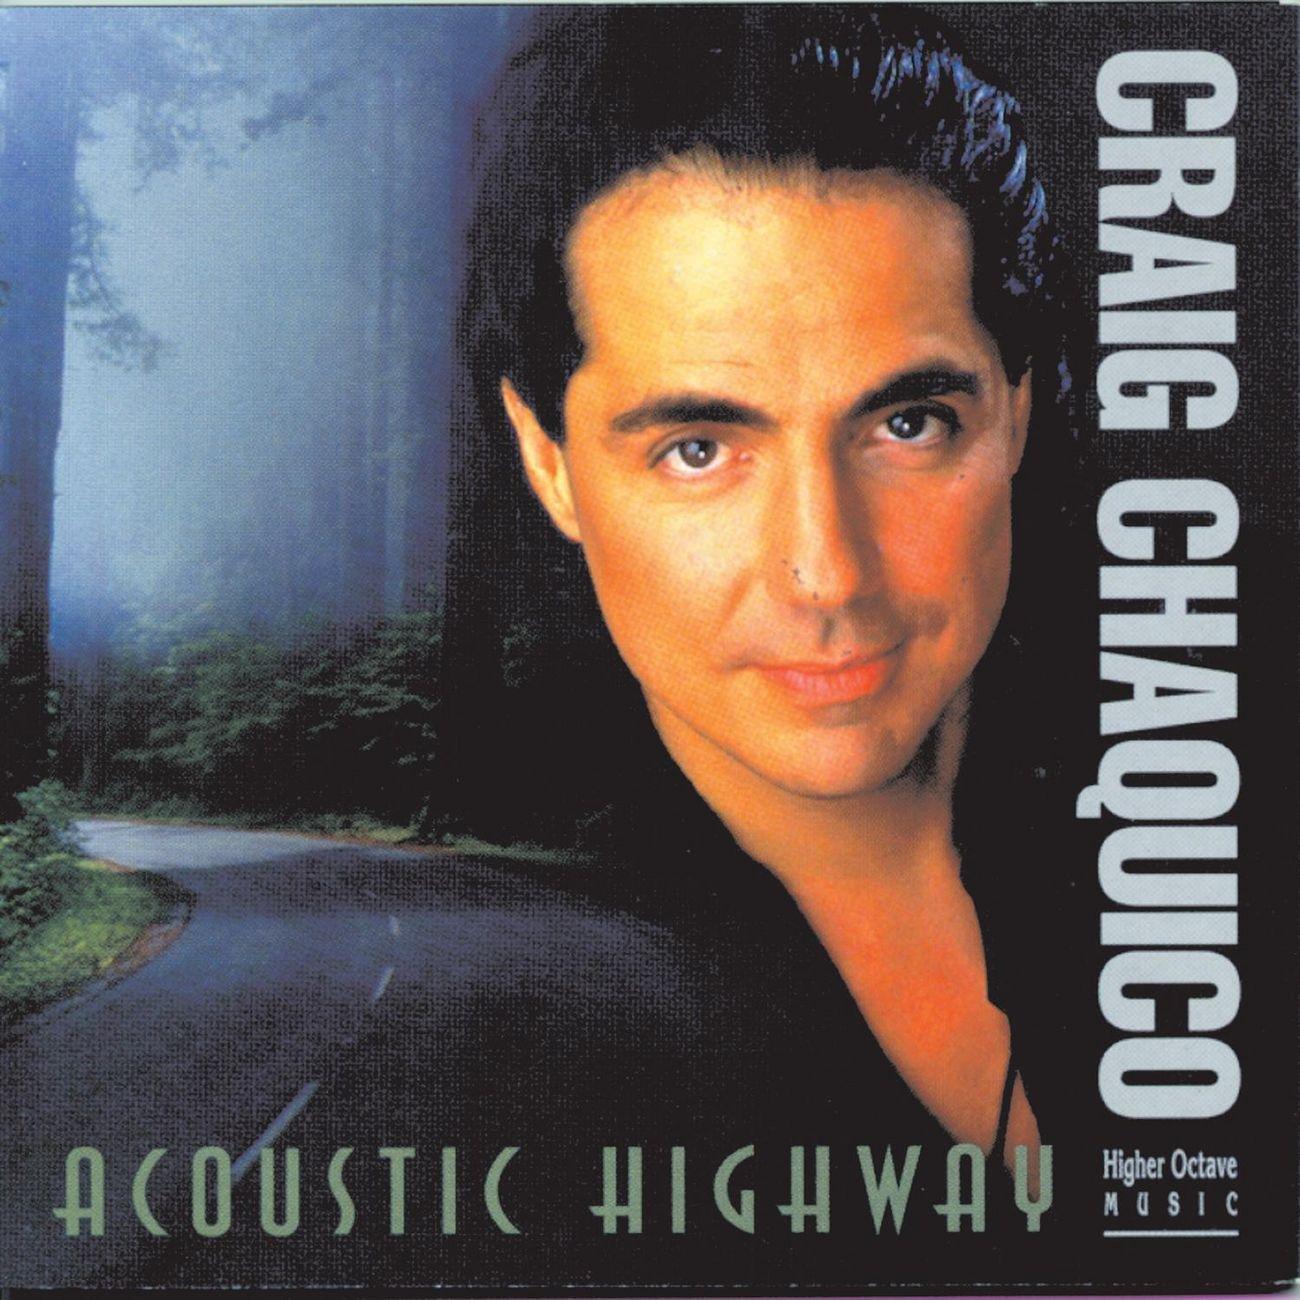 Craig Chaquico – Acoustic Highway (1993) [FLAC]